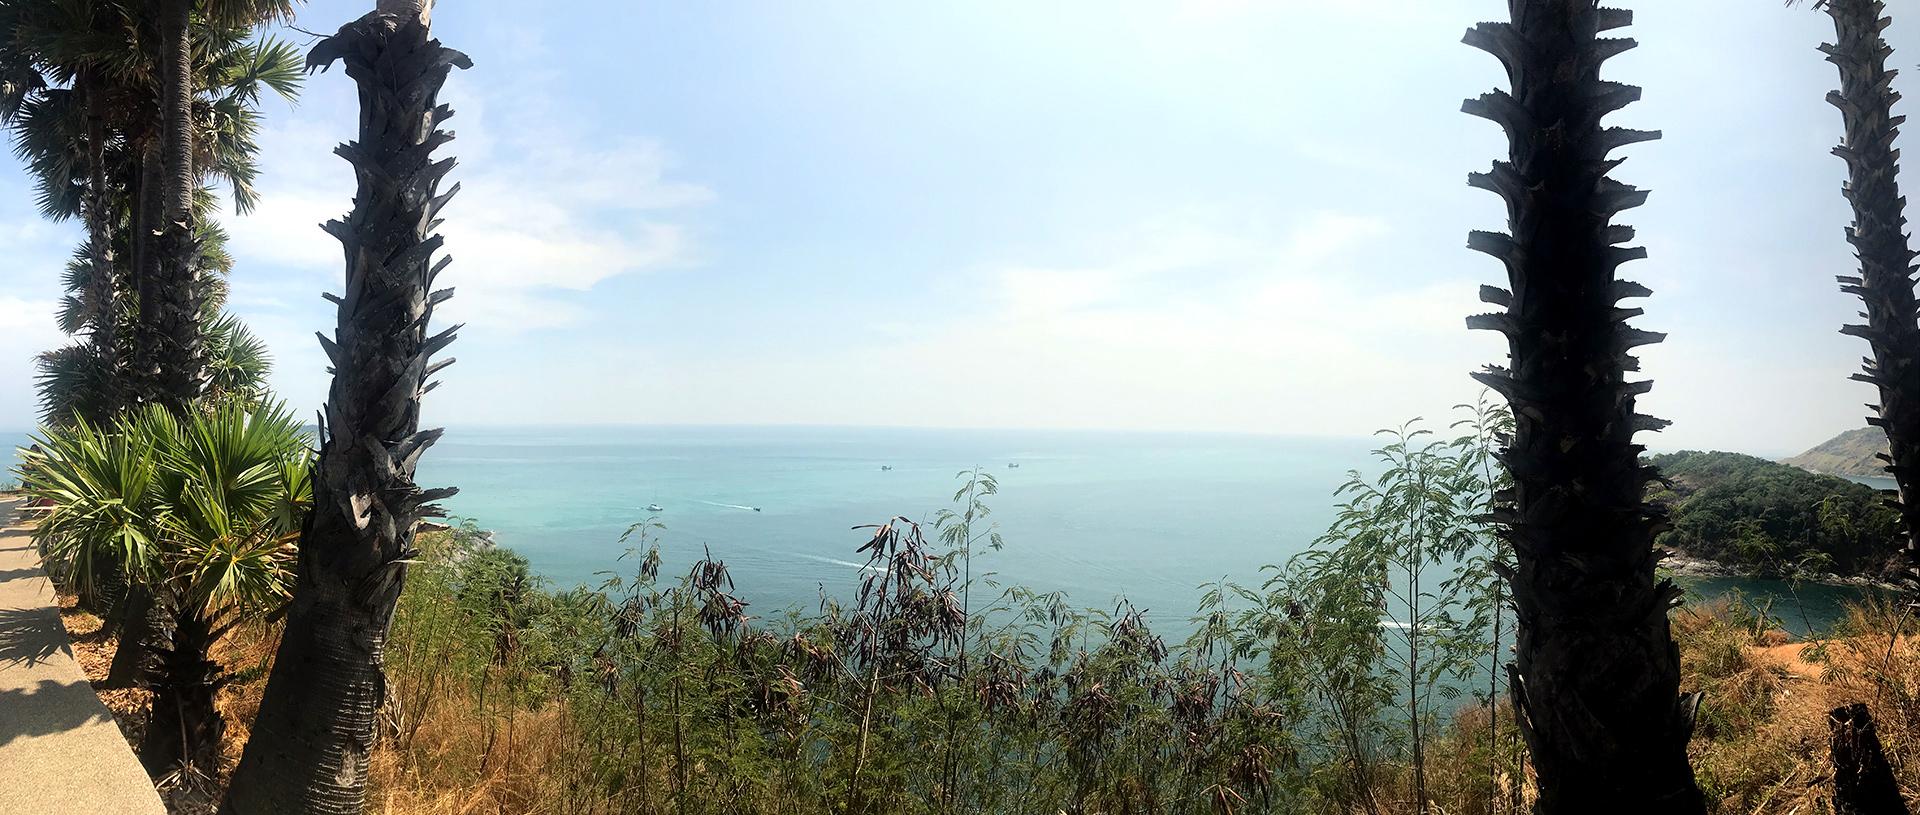 Phuket Reisetipps Promthep Viewpoint